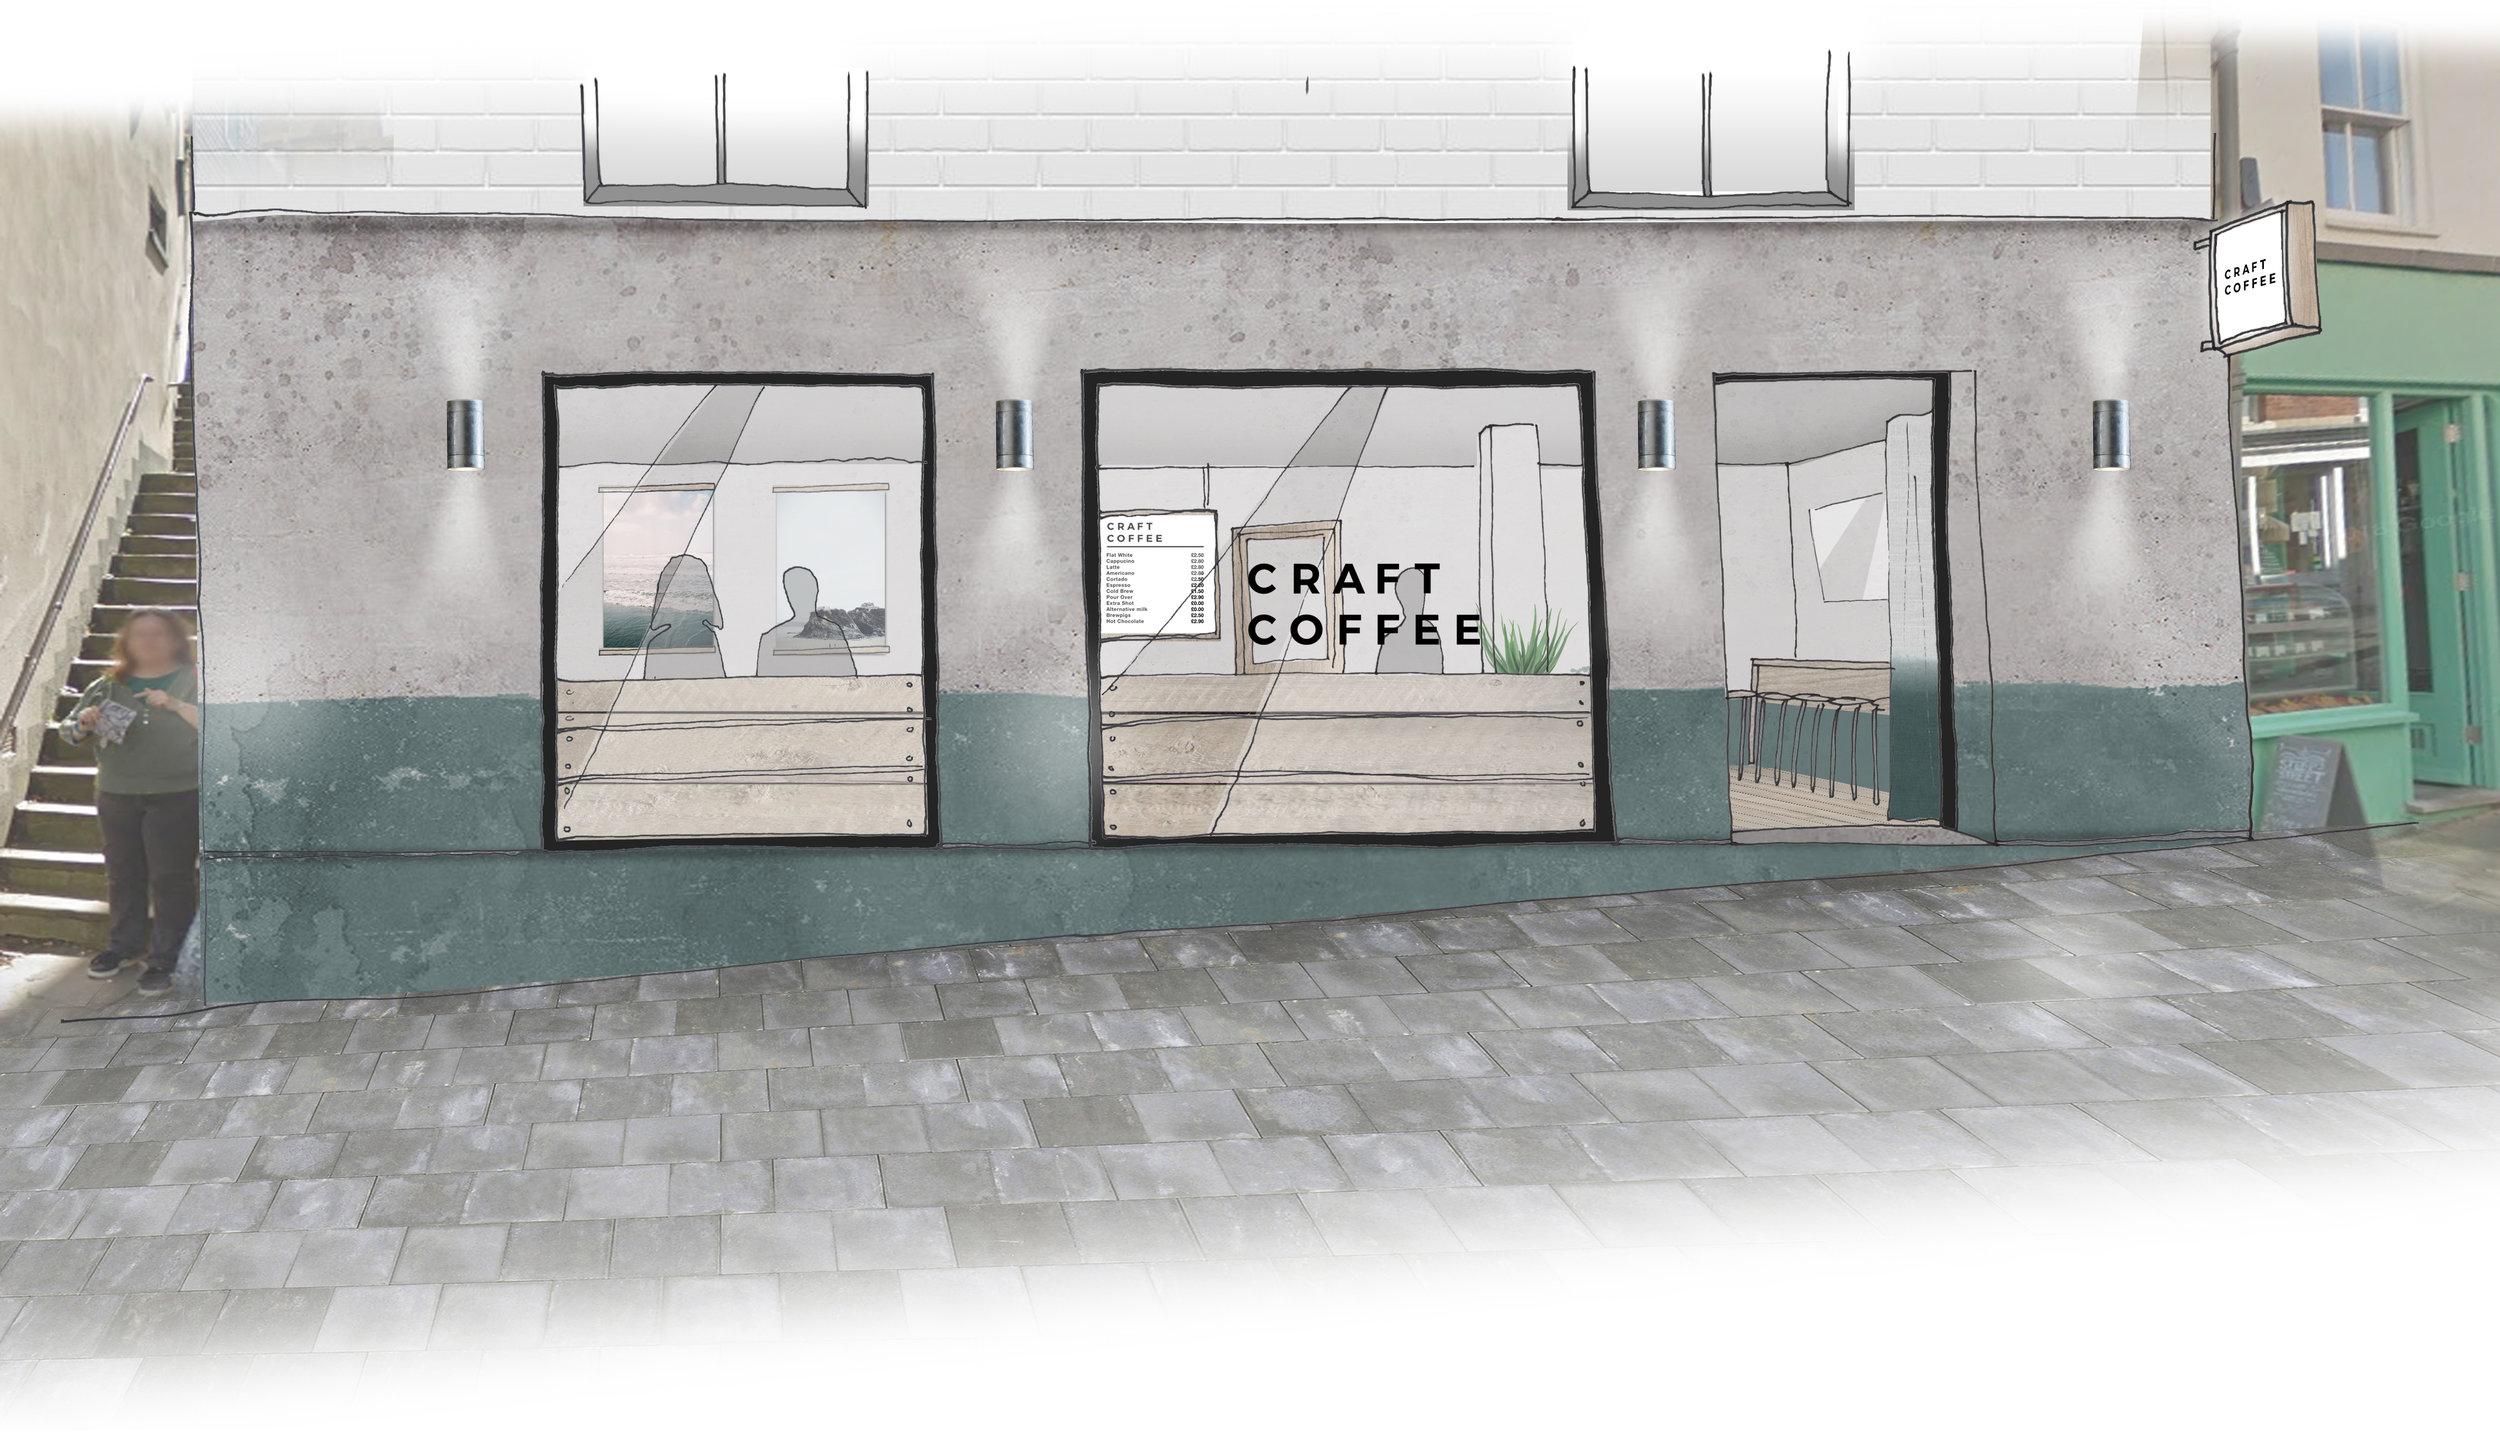 lunarlunar_interior_design_cafe_craft_coffee_banquette_hastings_sketch.jpg